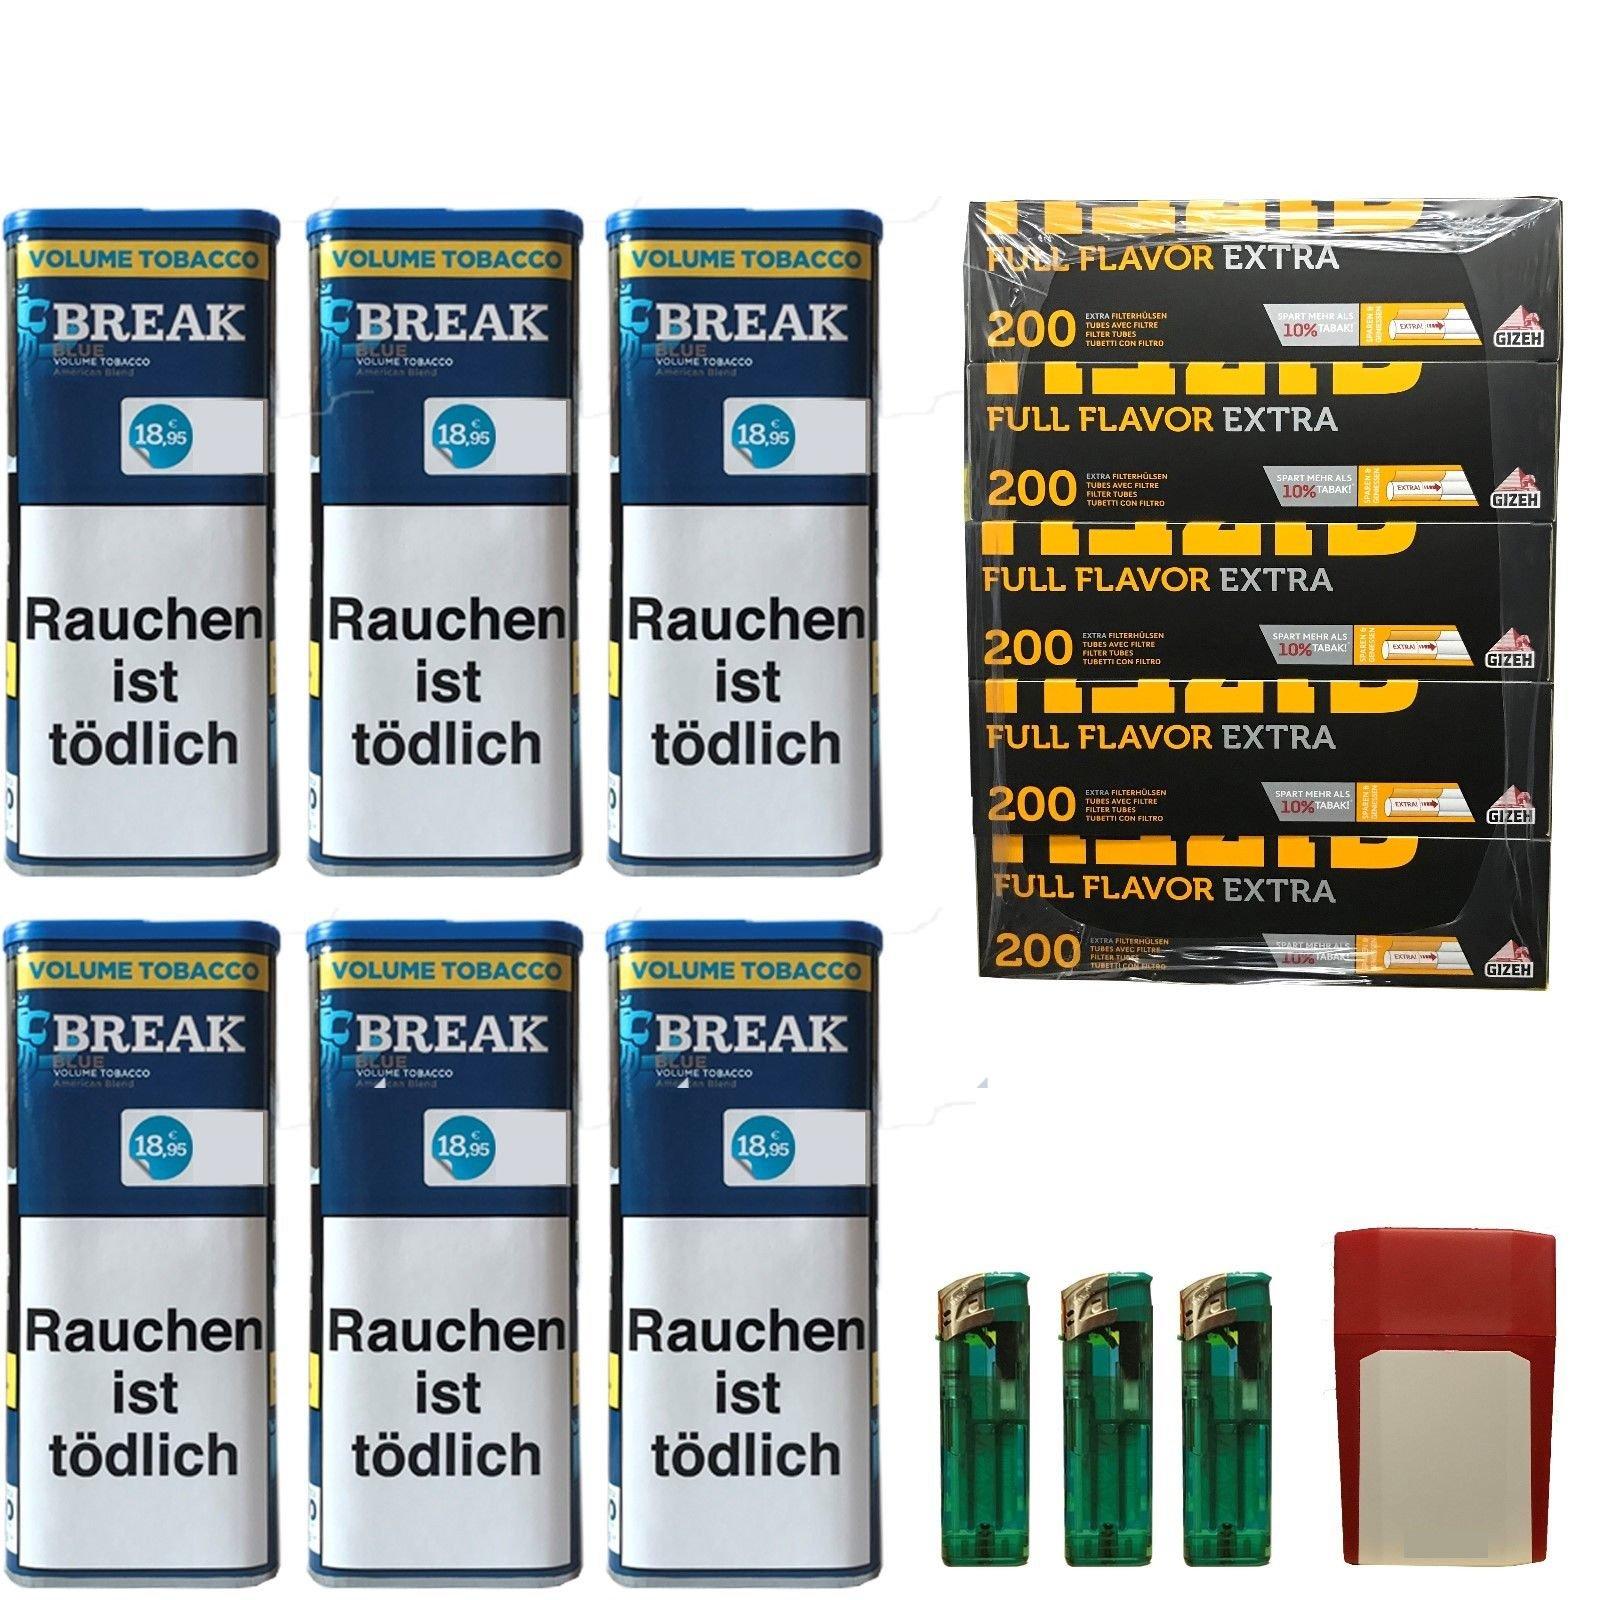 6x Break Blue/Blau XXL Volumentabak 120g, Full Flavor Extra Hülsen, Feuerz., Box